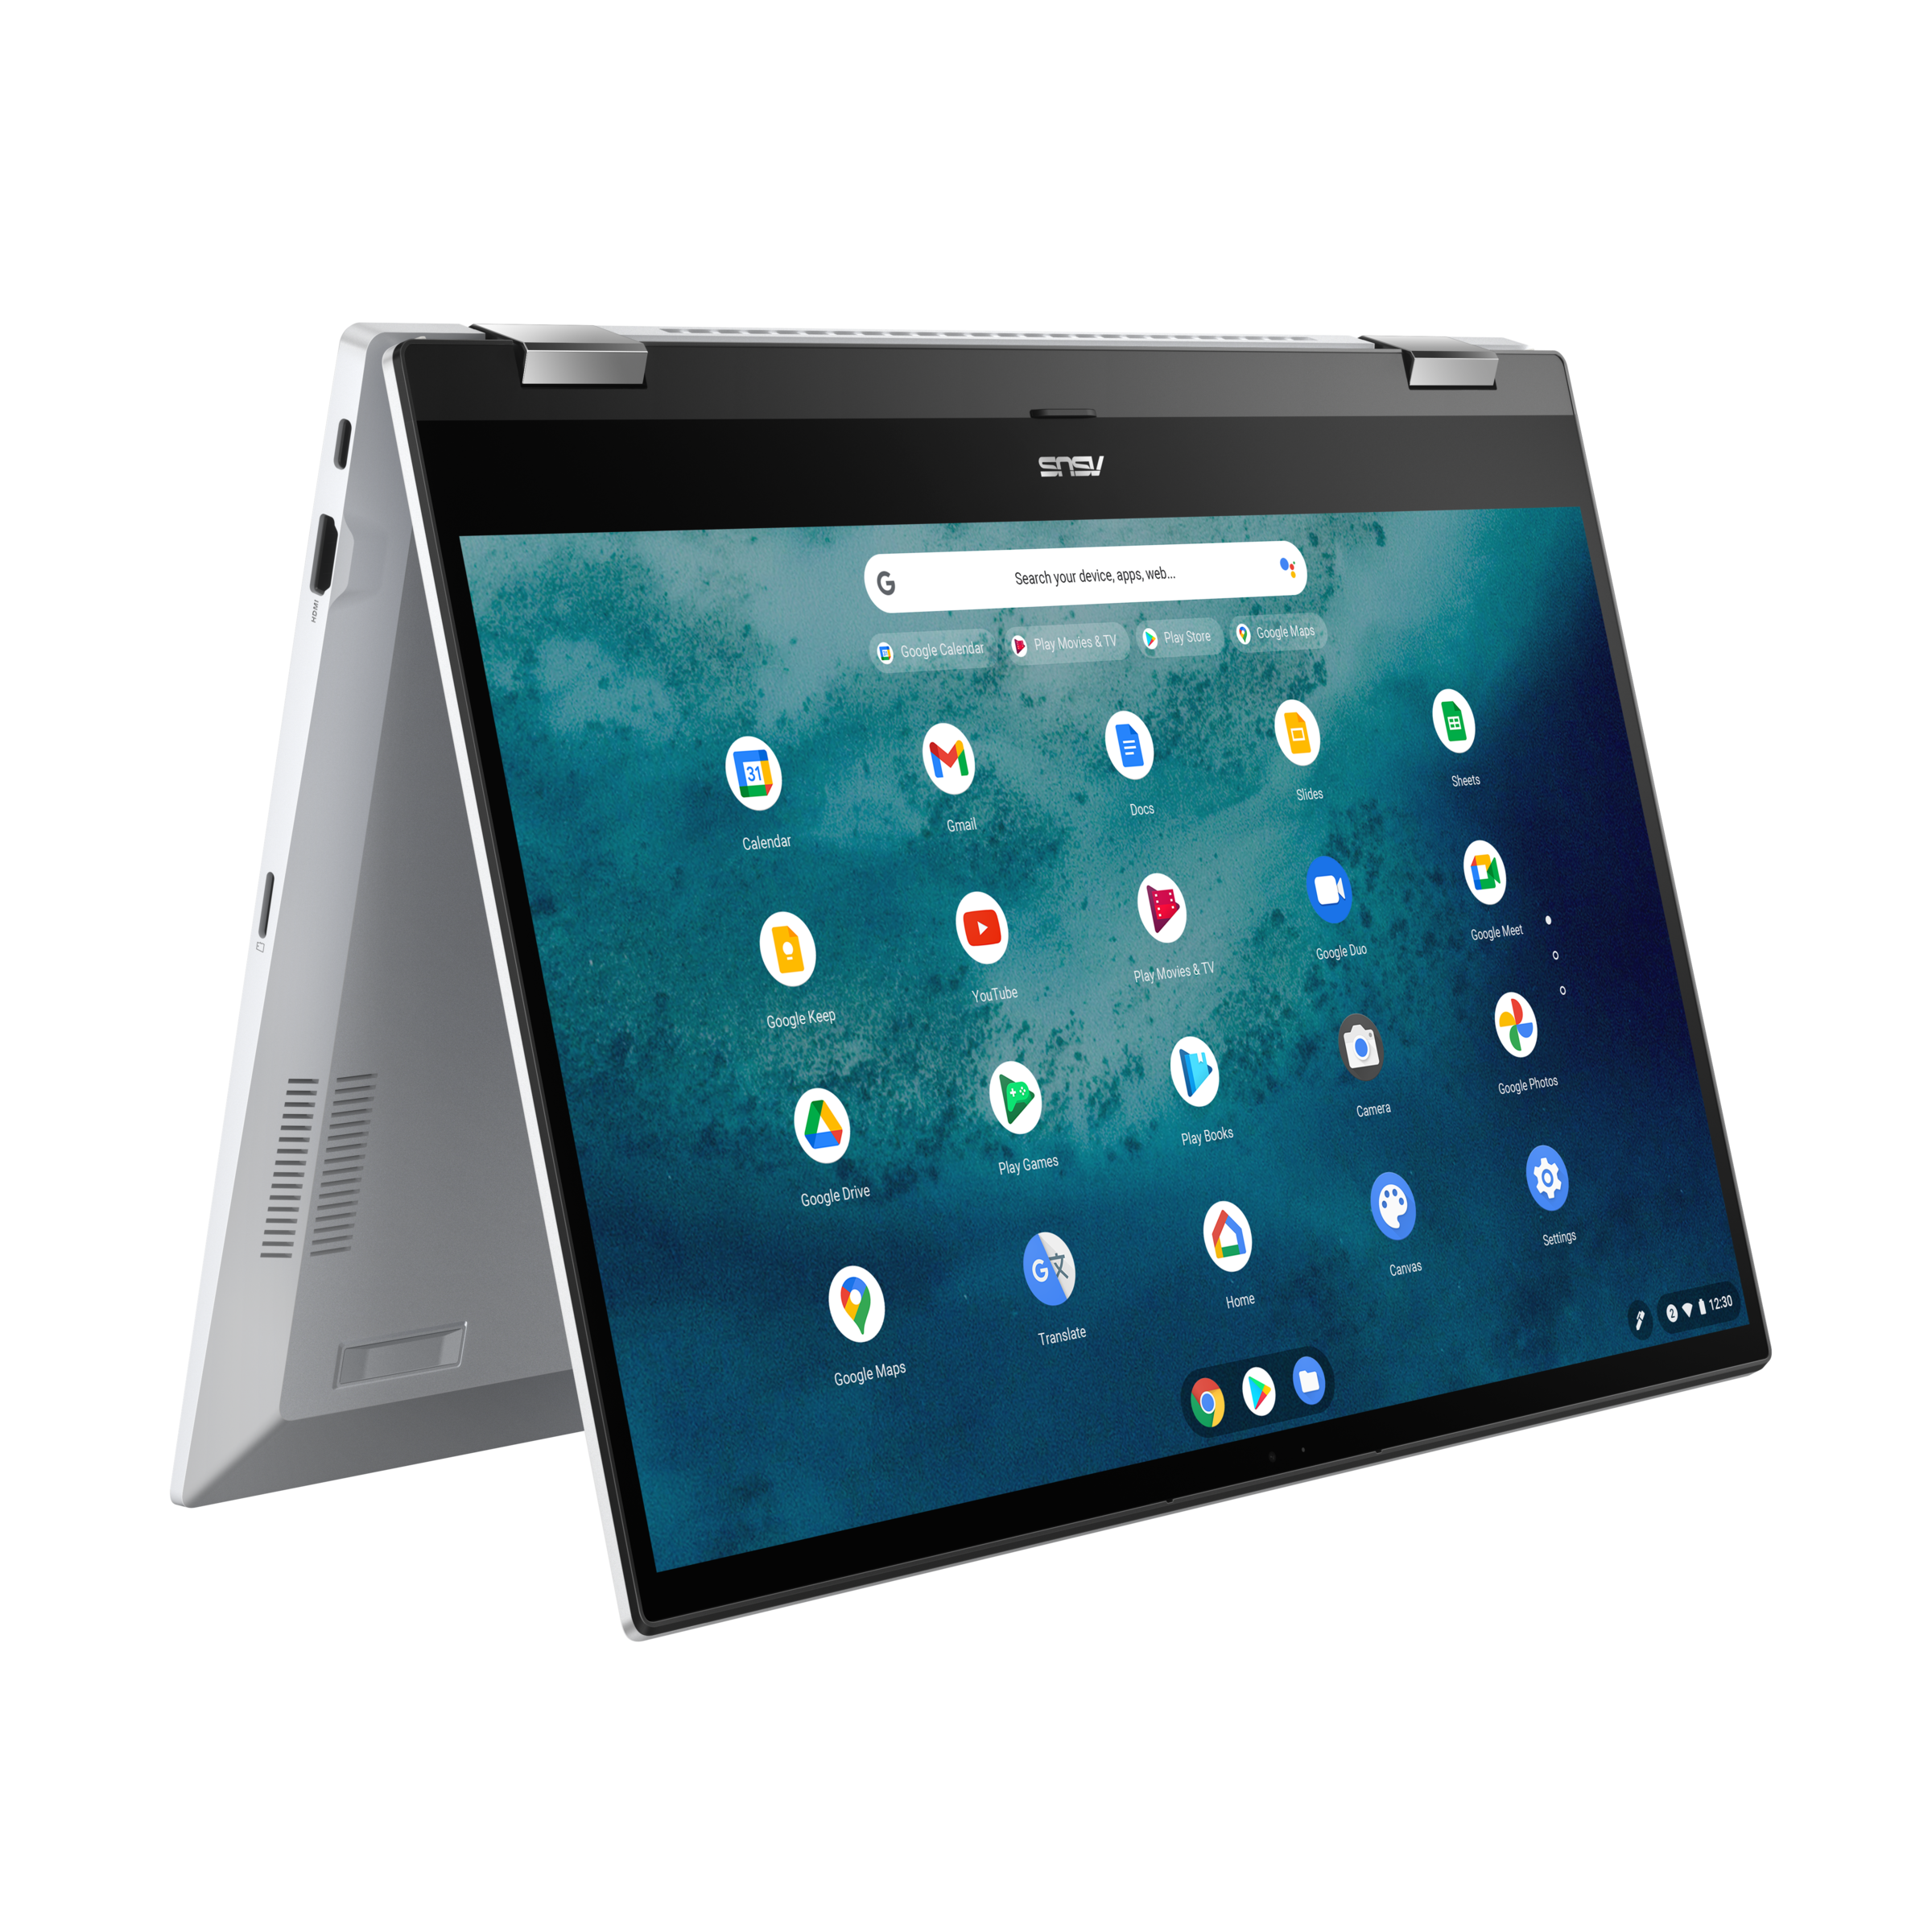 ASUS Chromebook Flip CX5 (CX5500)